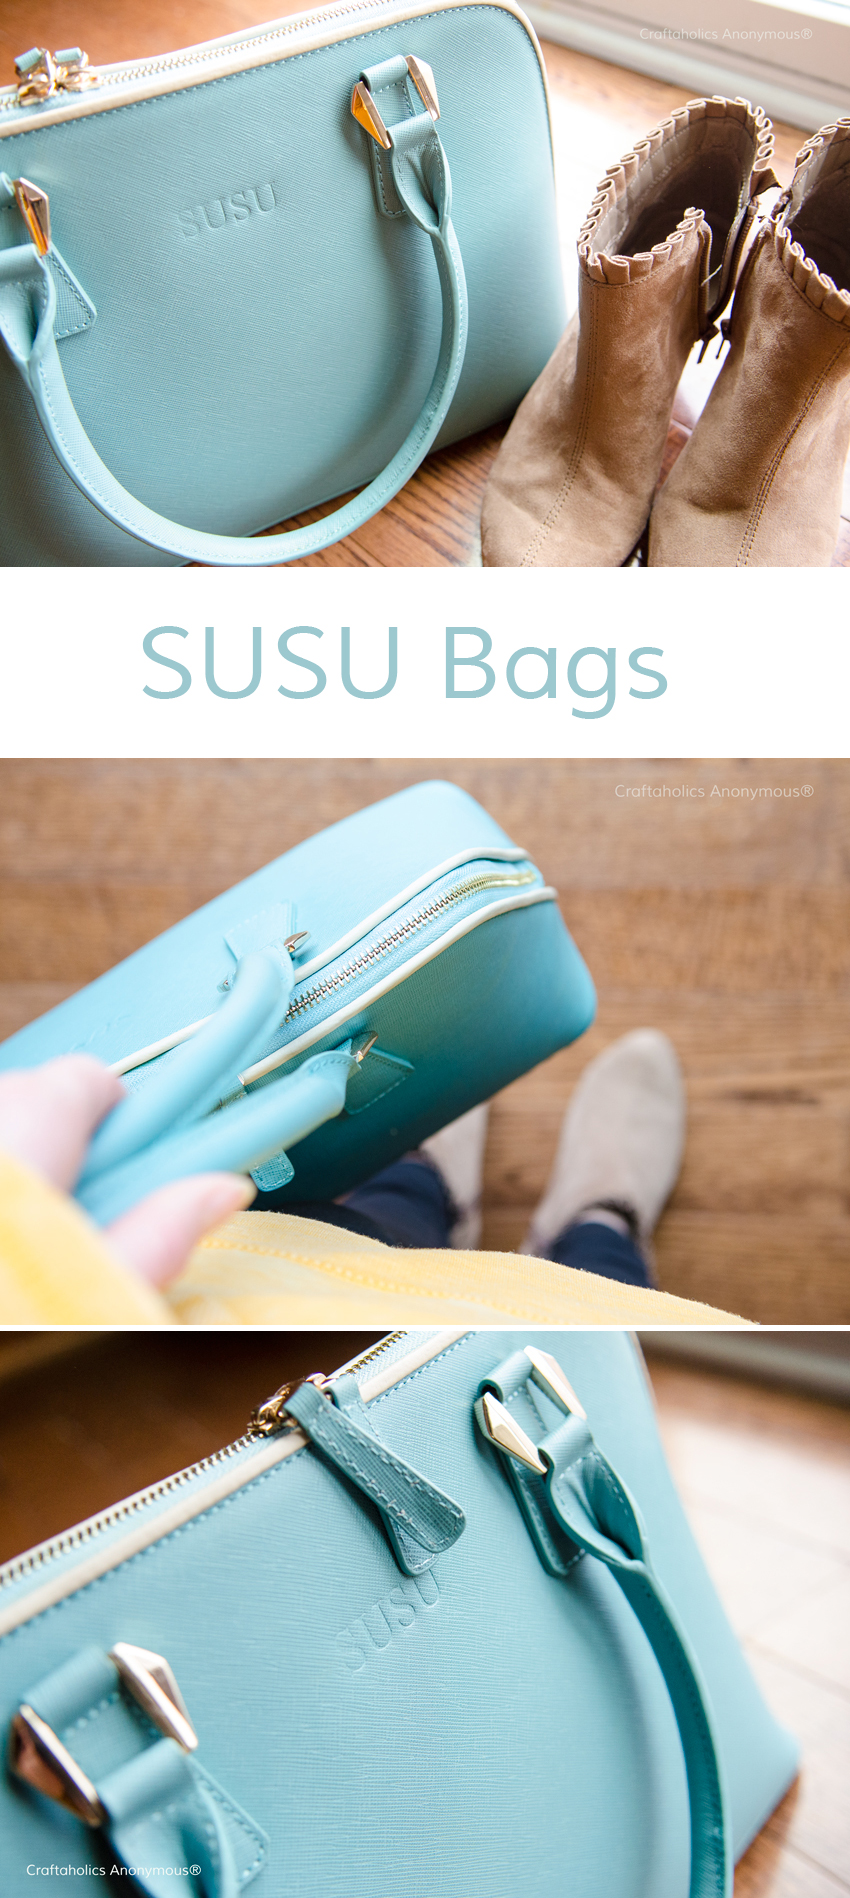 susu-bags-collage